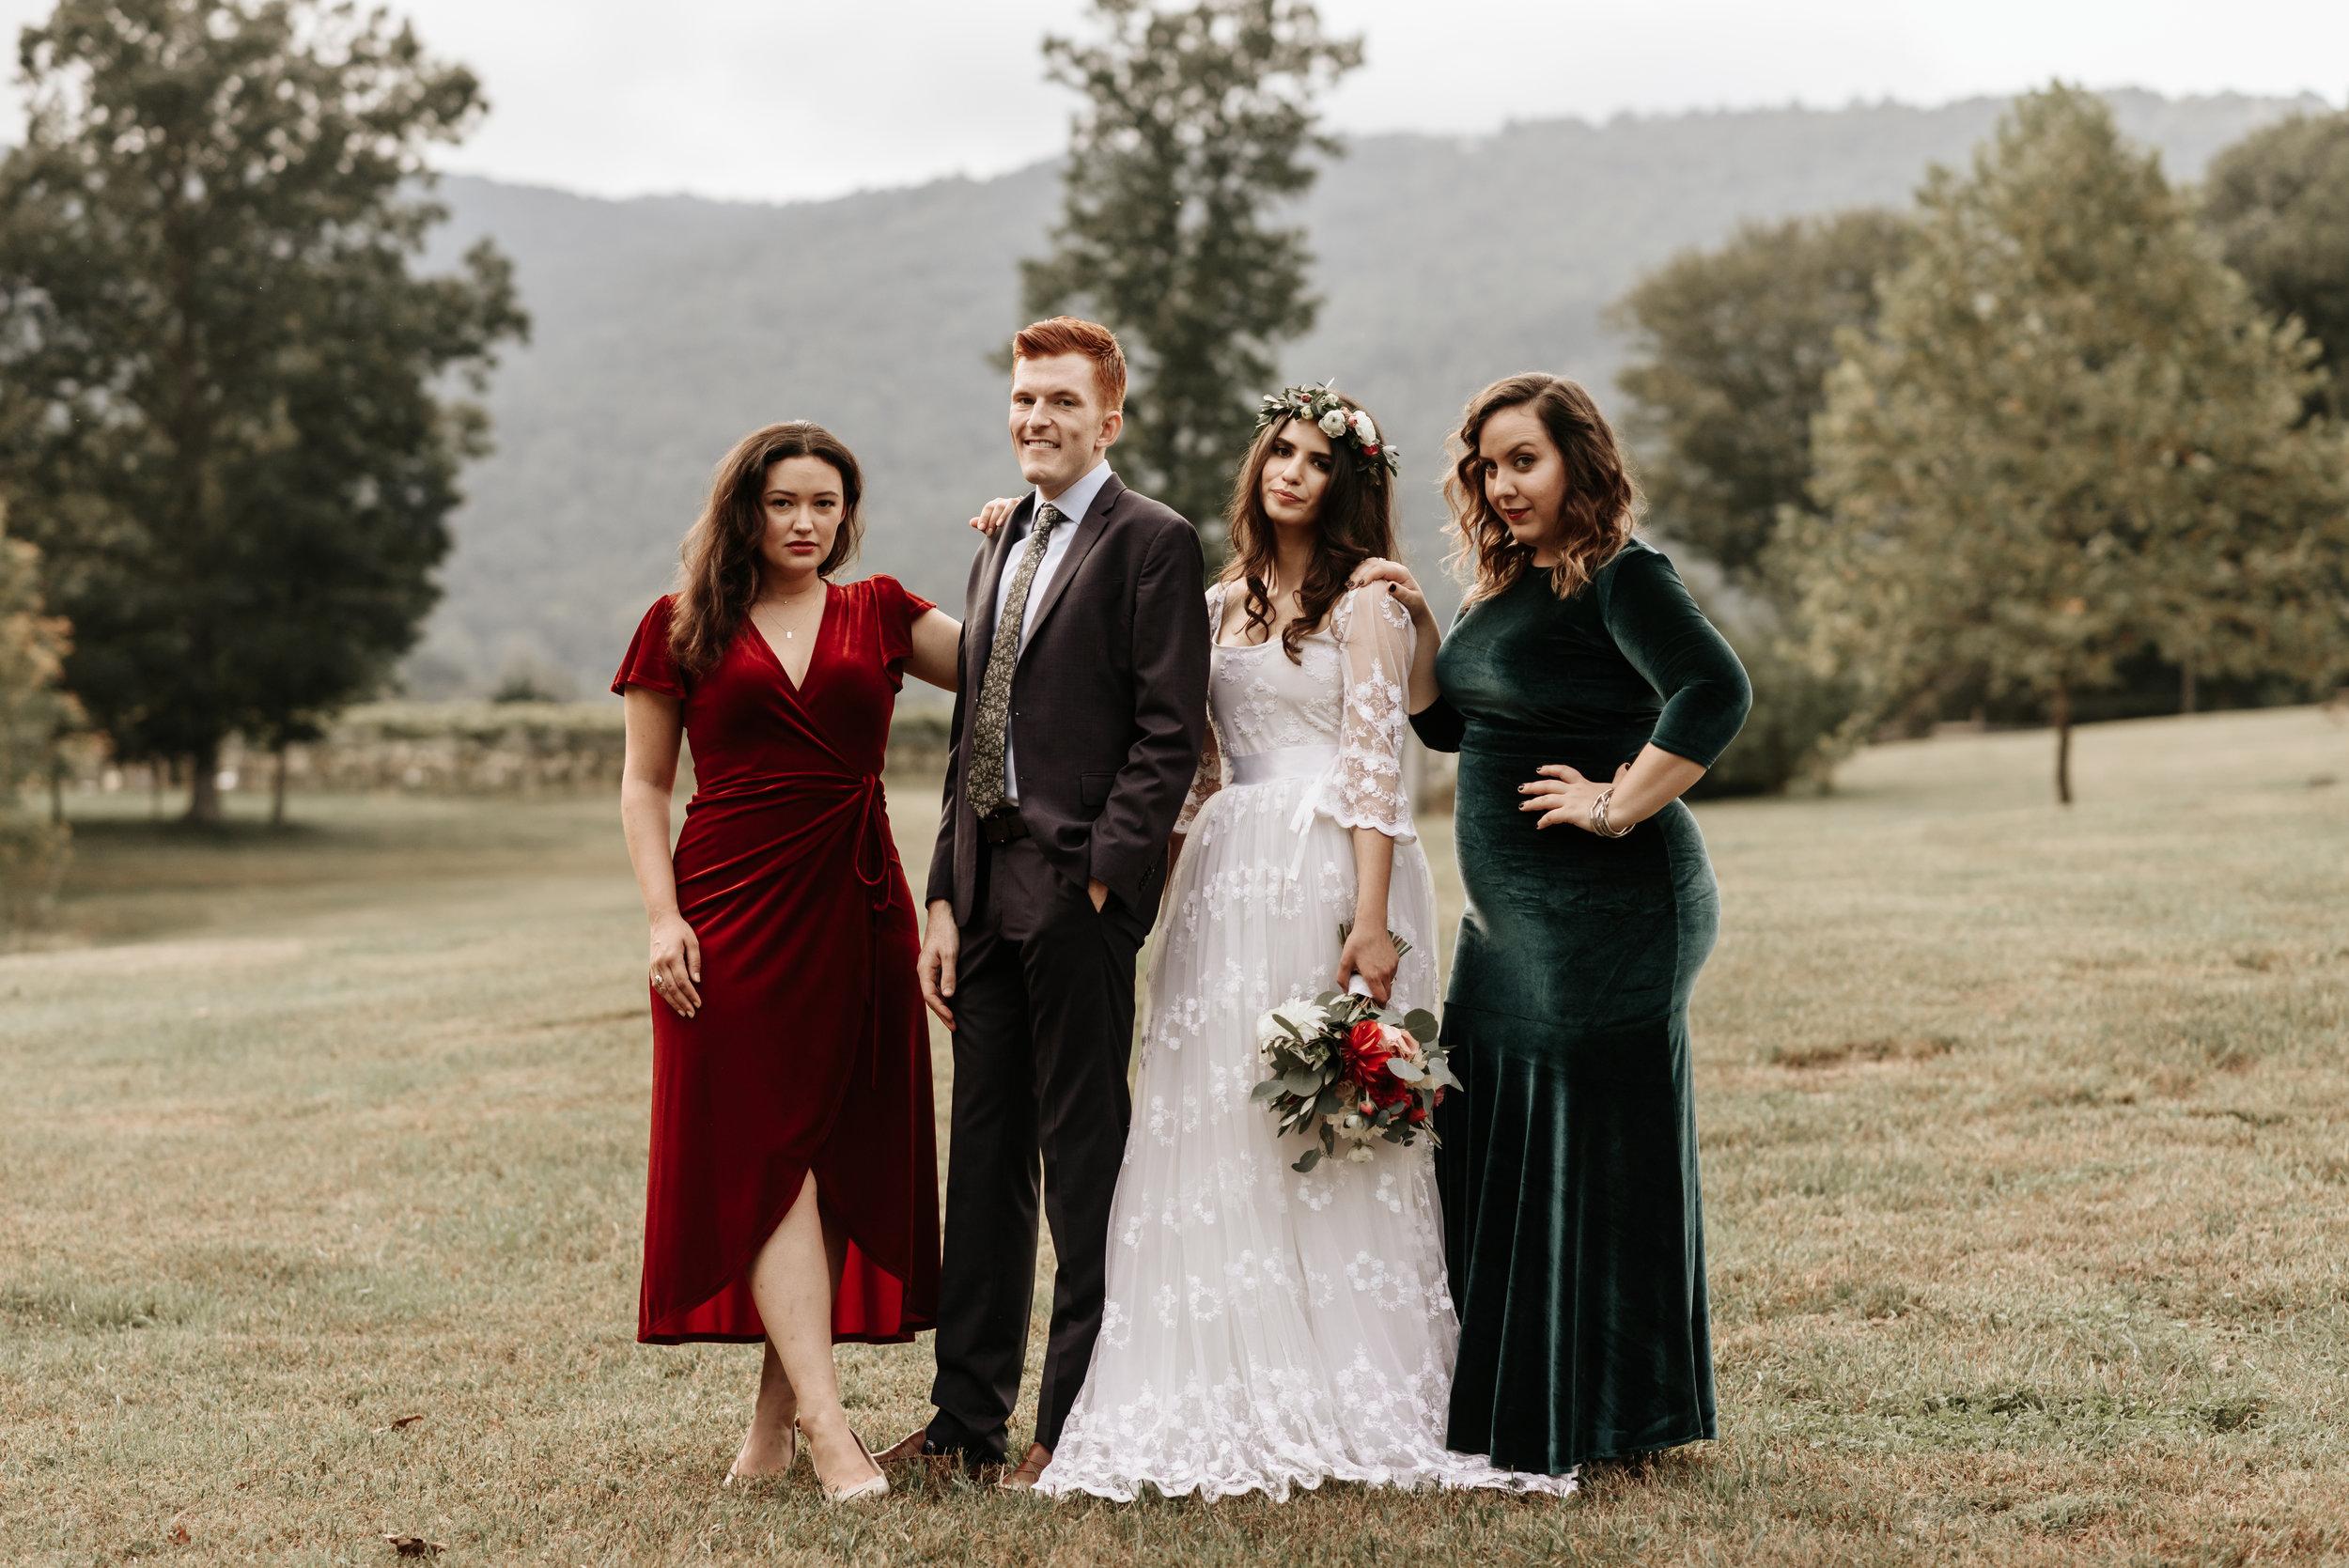 Veritas-Vineyards-and-Winery-Wedding-Photography-Afton-Virginia-Yasmin-Seth-Photography-by-V-2370.jpg